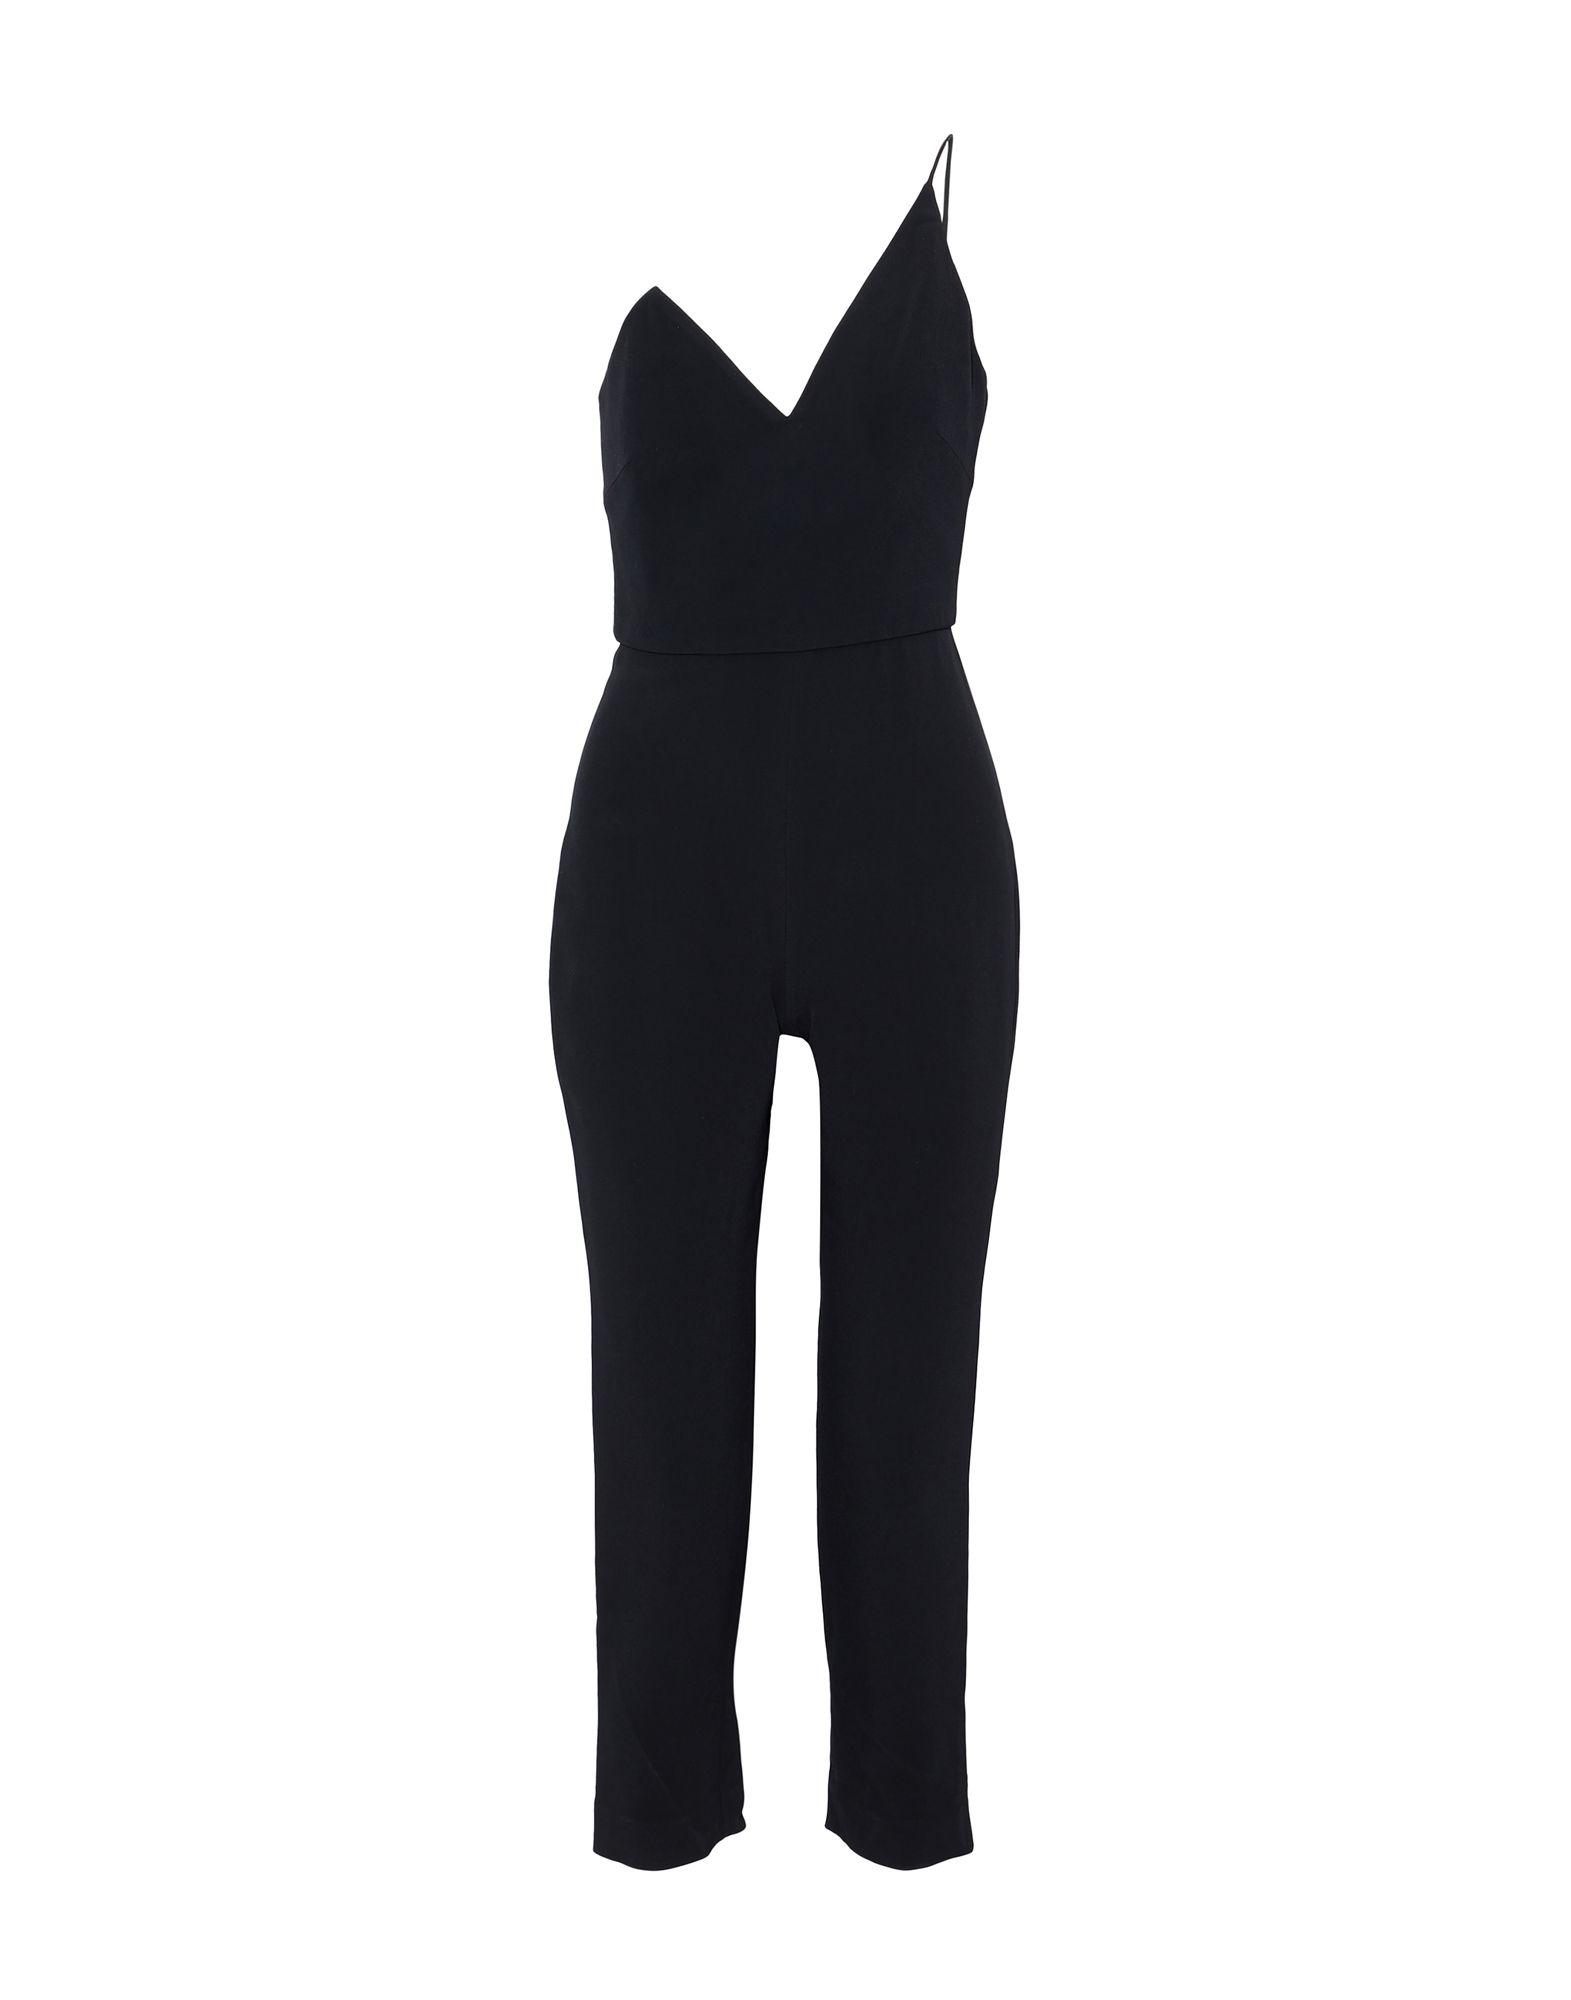 28e552bbdd42 Lyst - Cushnie Et Ochs Jumpsuit in Black